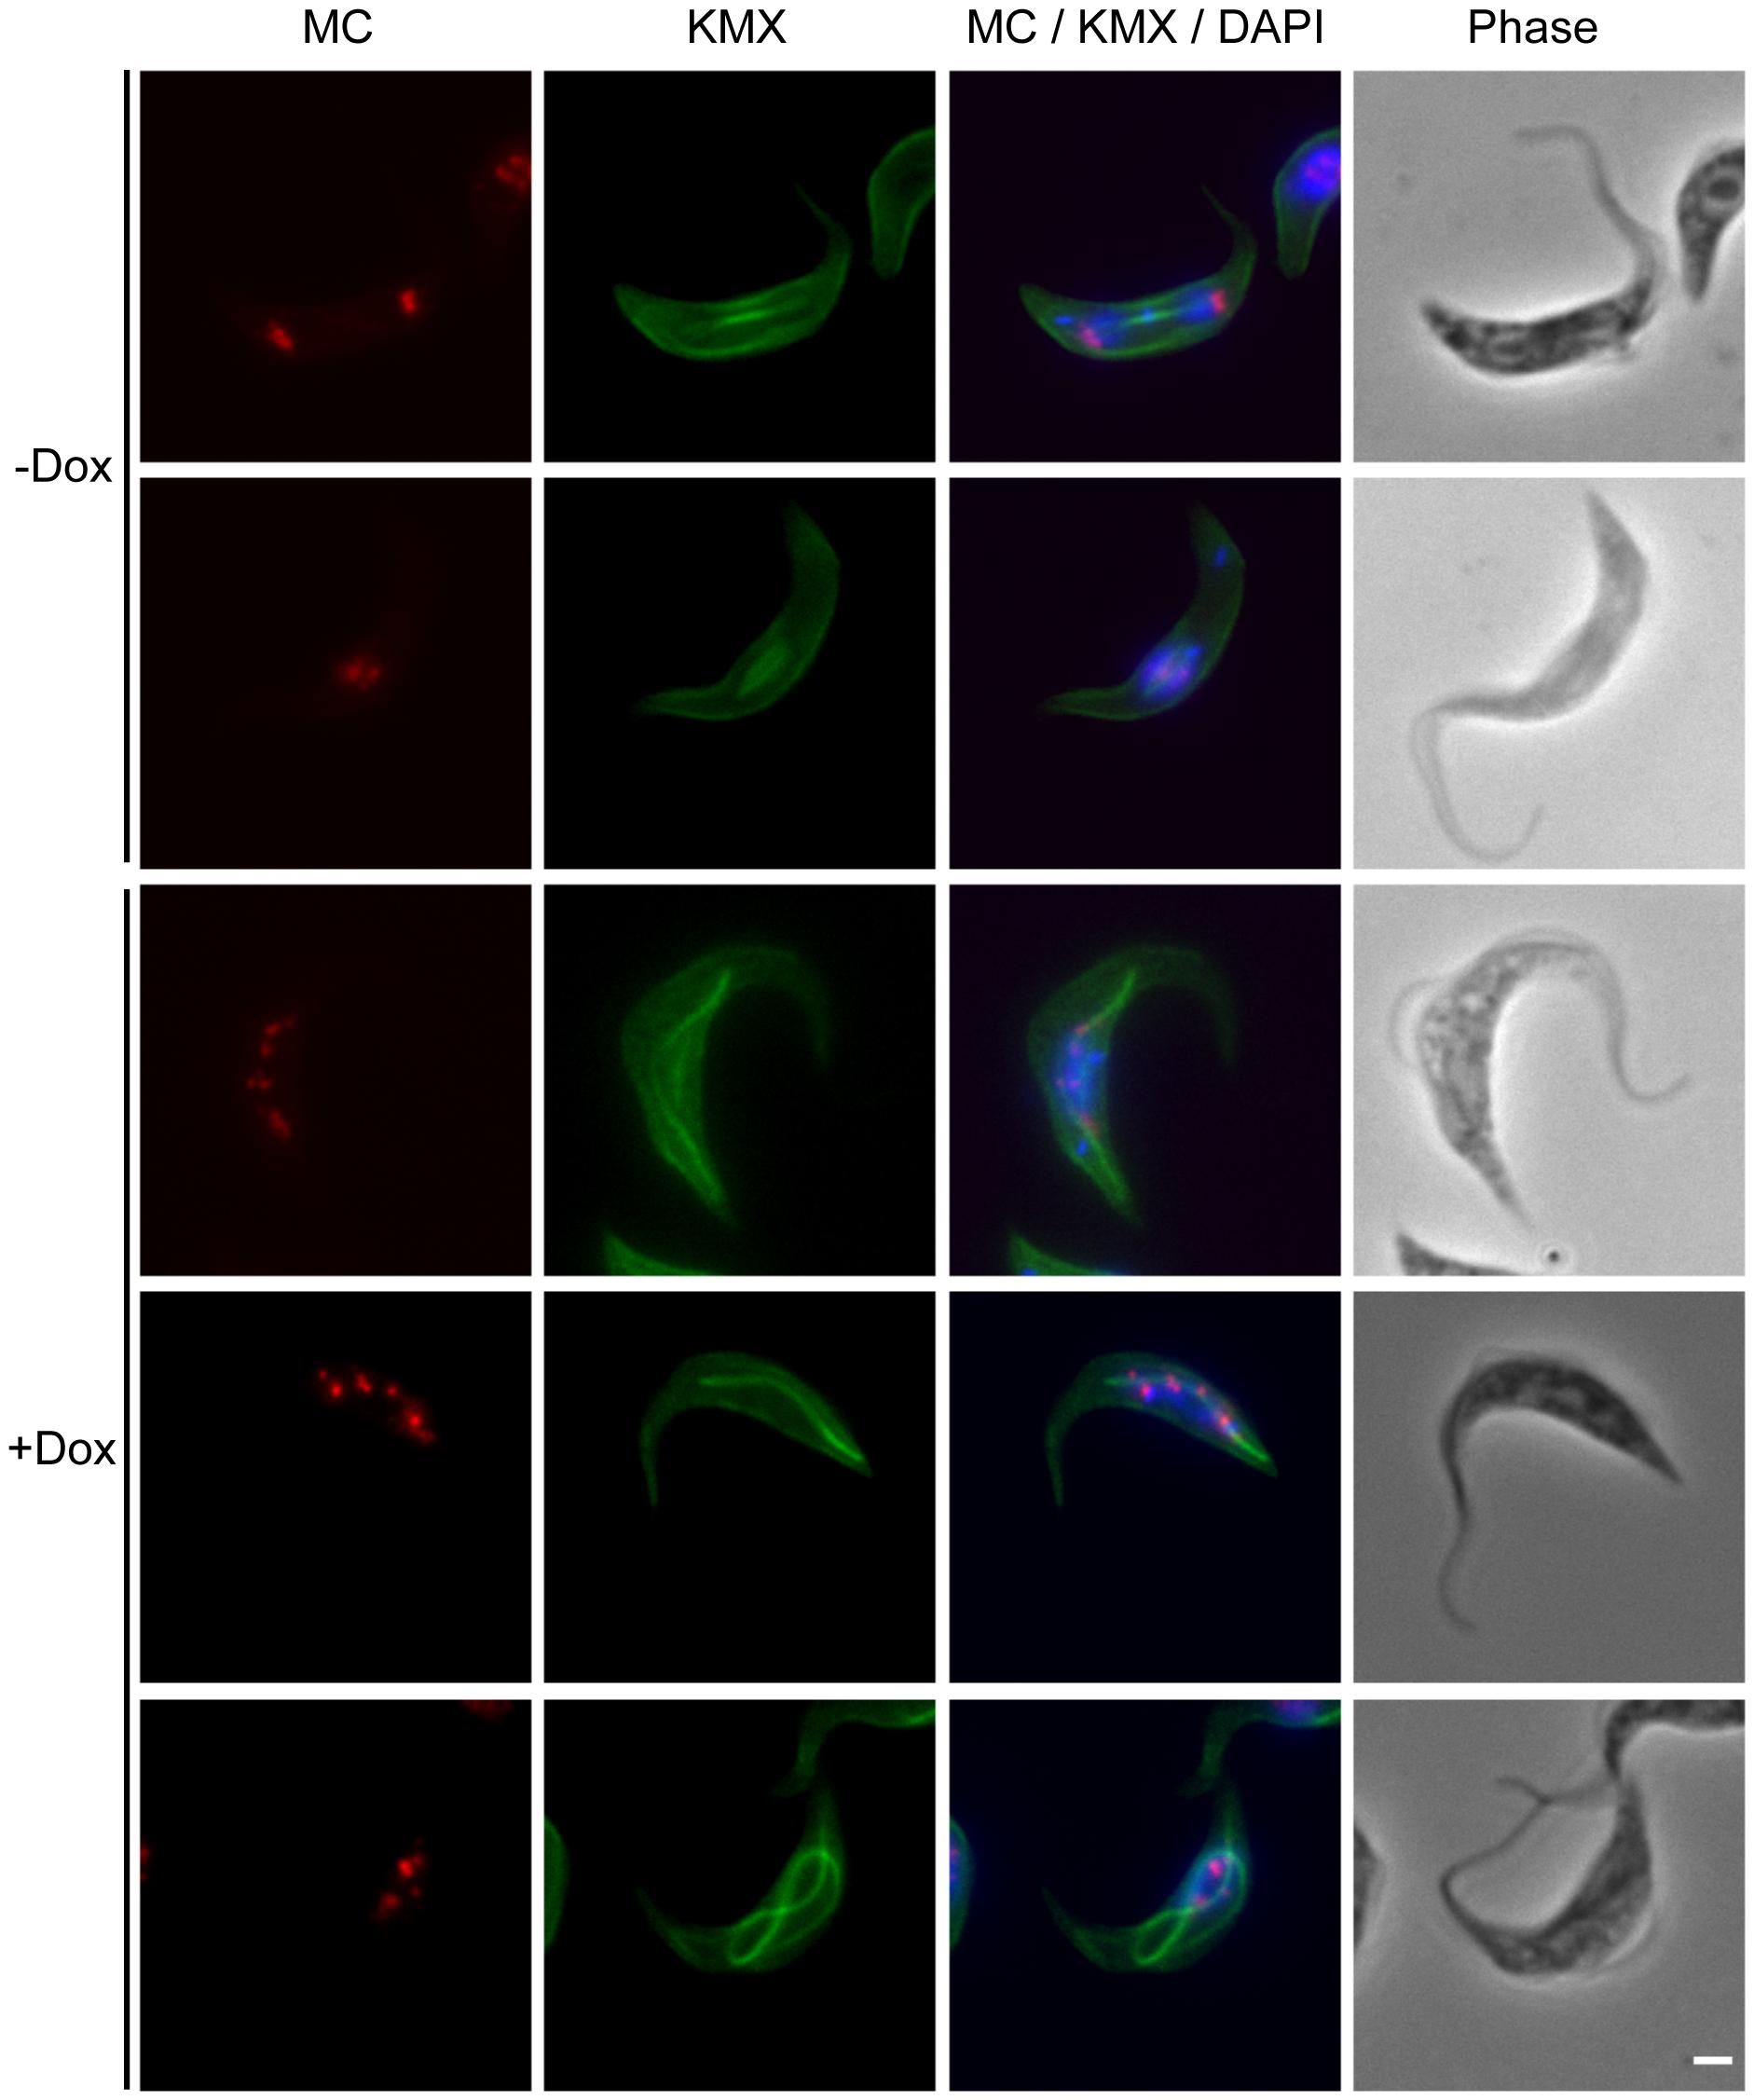 TbKif13-1 depletion results in chromosome segregation defects.